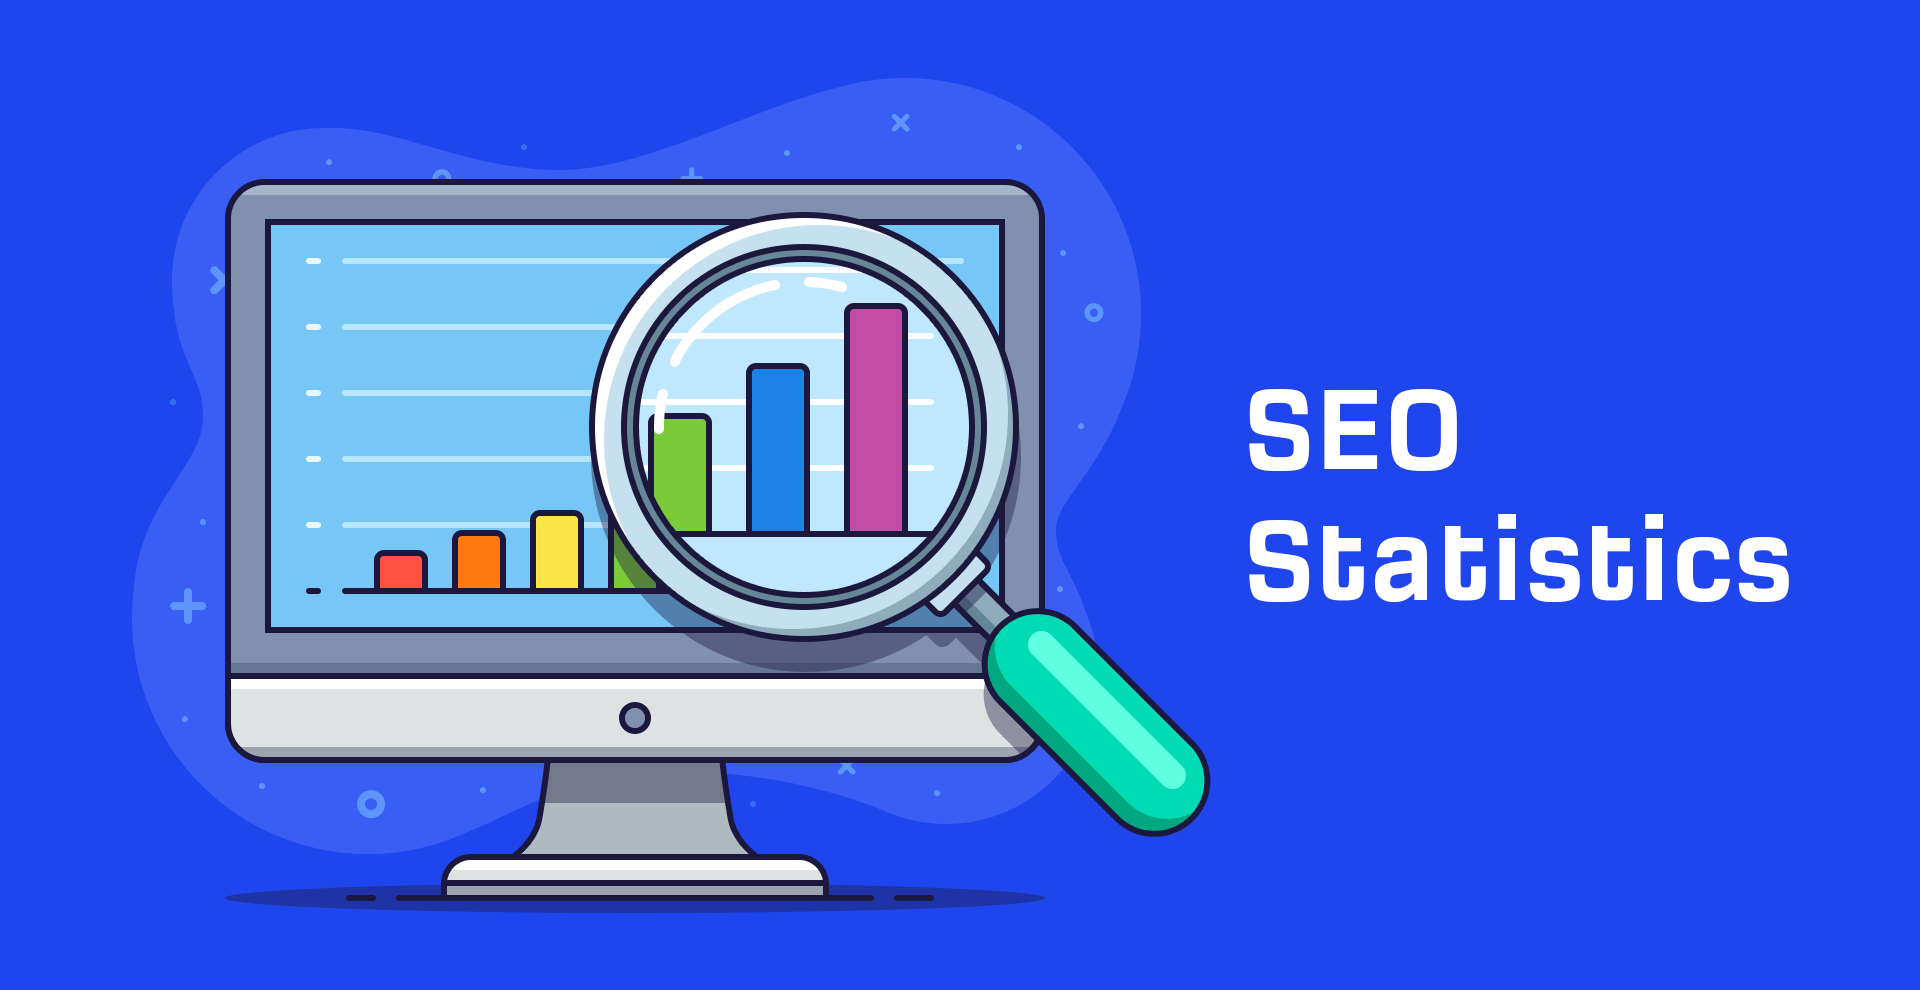 fb seo statistics 1